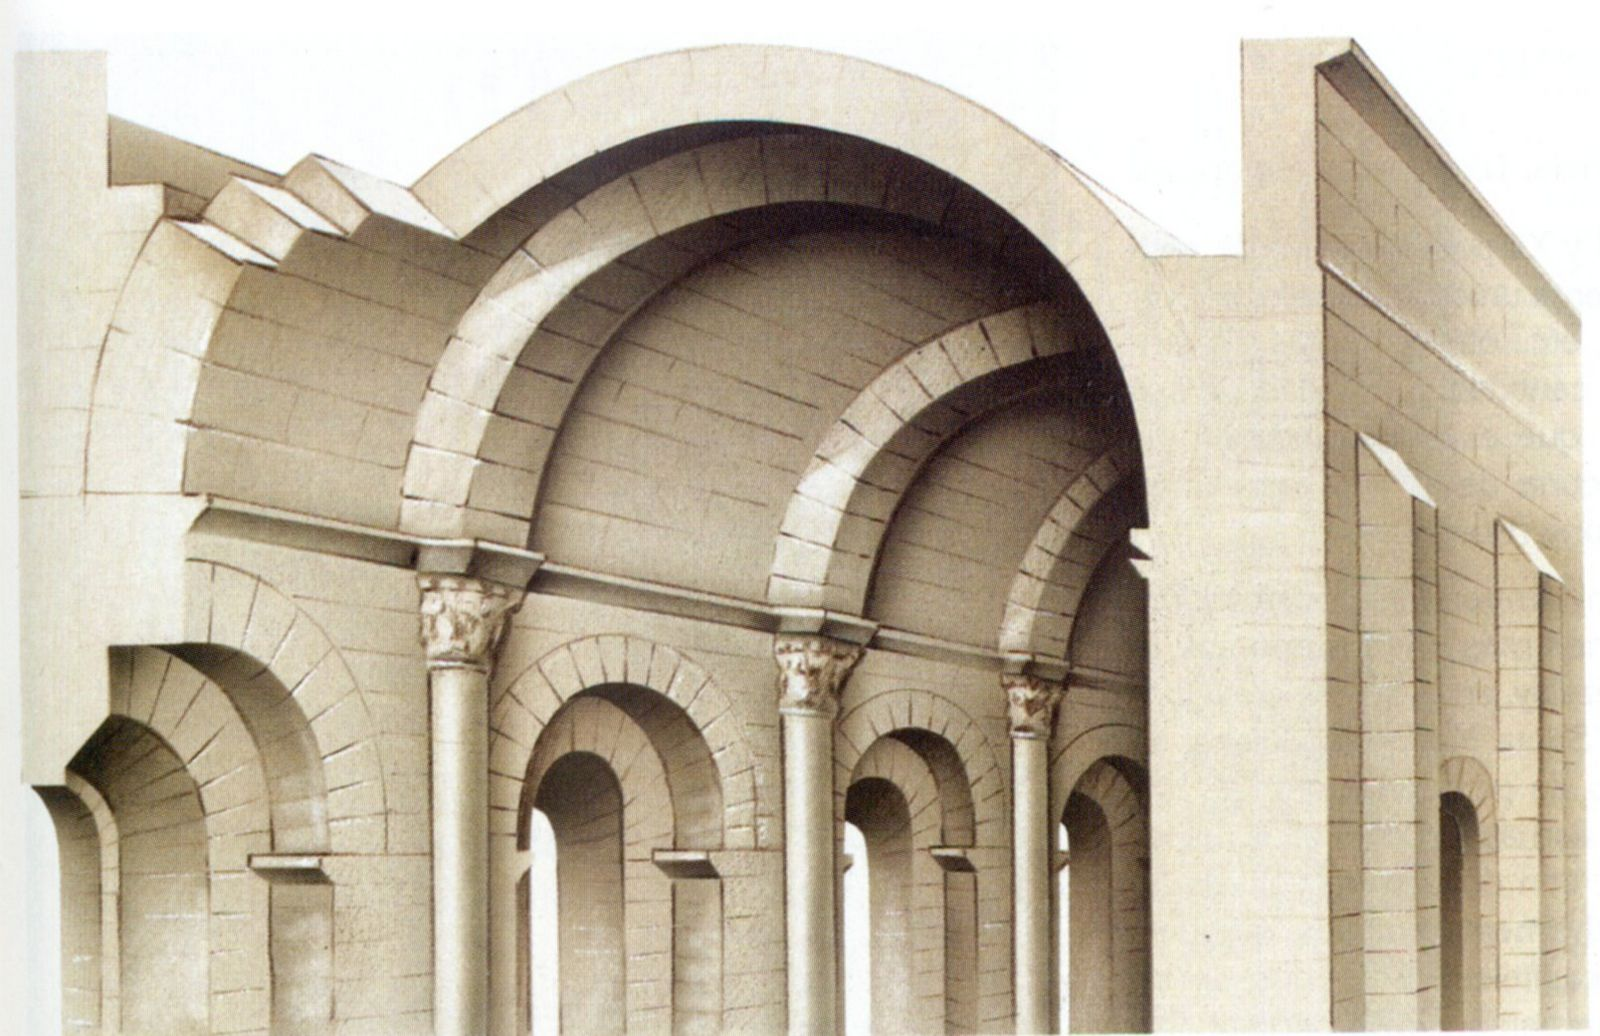 Ipaez arco faj n for Arquitectura definicion